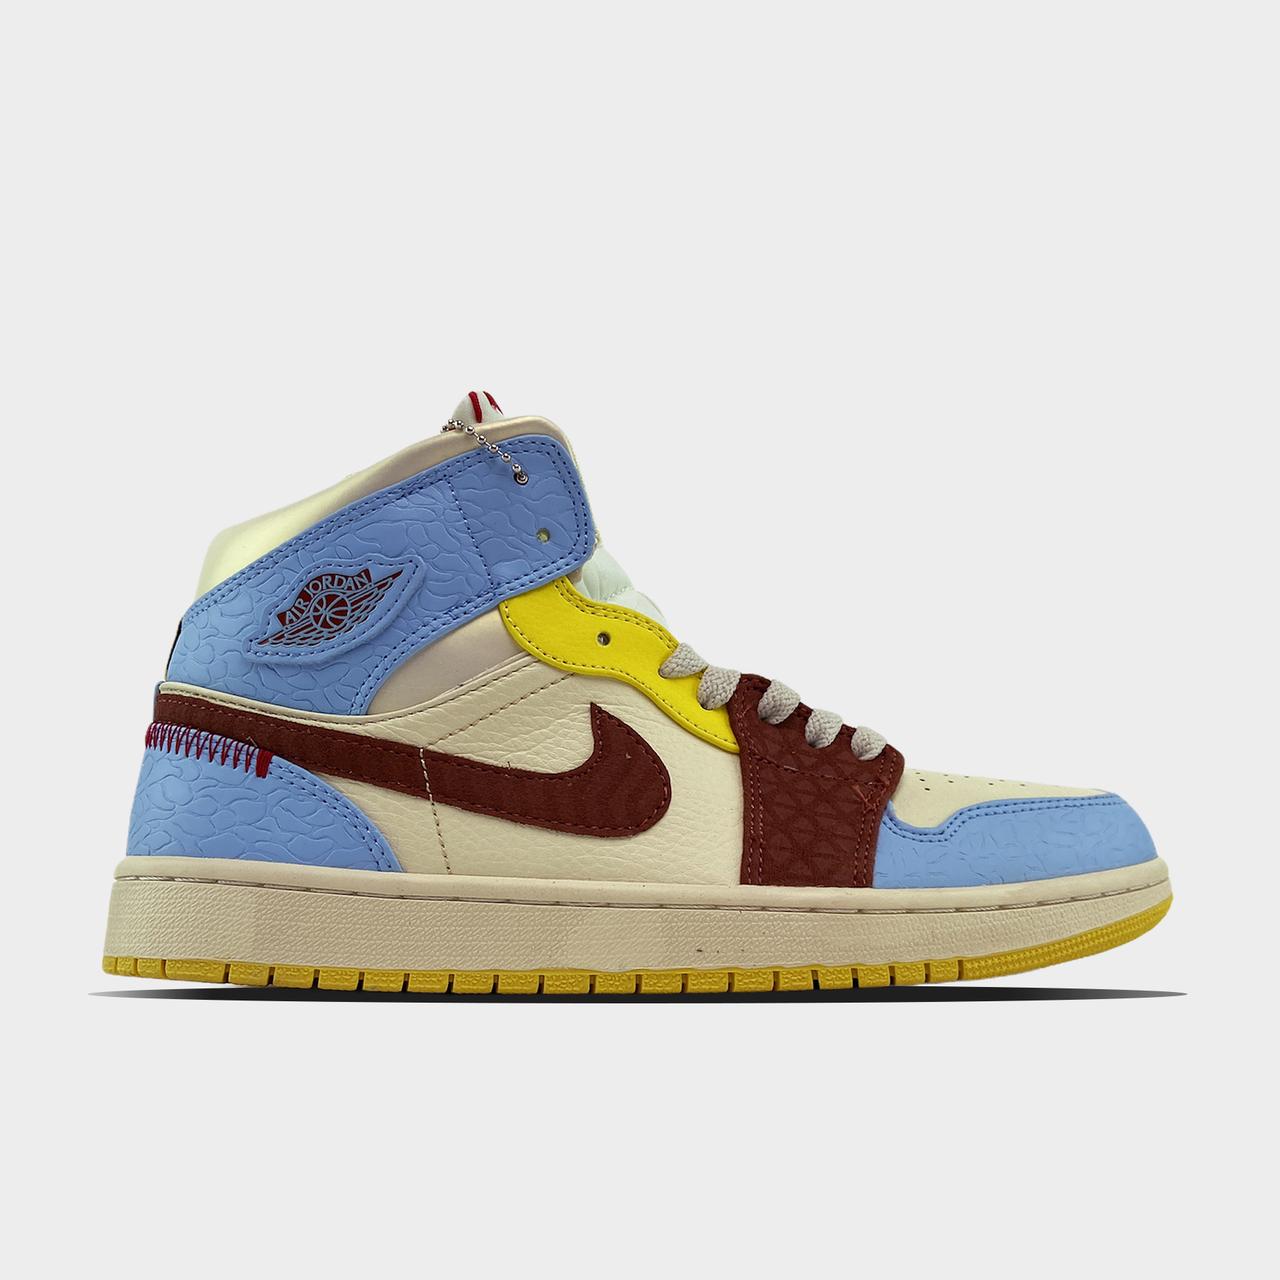 Nk, крос, обувь, взуття, sneakers, шузы, Air Jordan 1 Mid SE Fearless Maison Chateau Rouge (Бежевый Голубой)